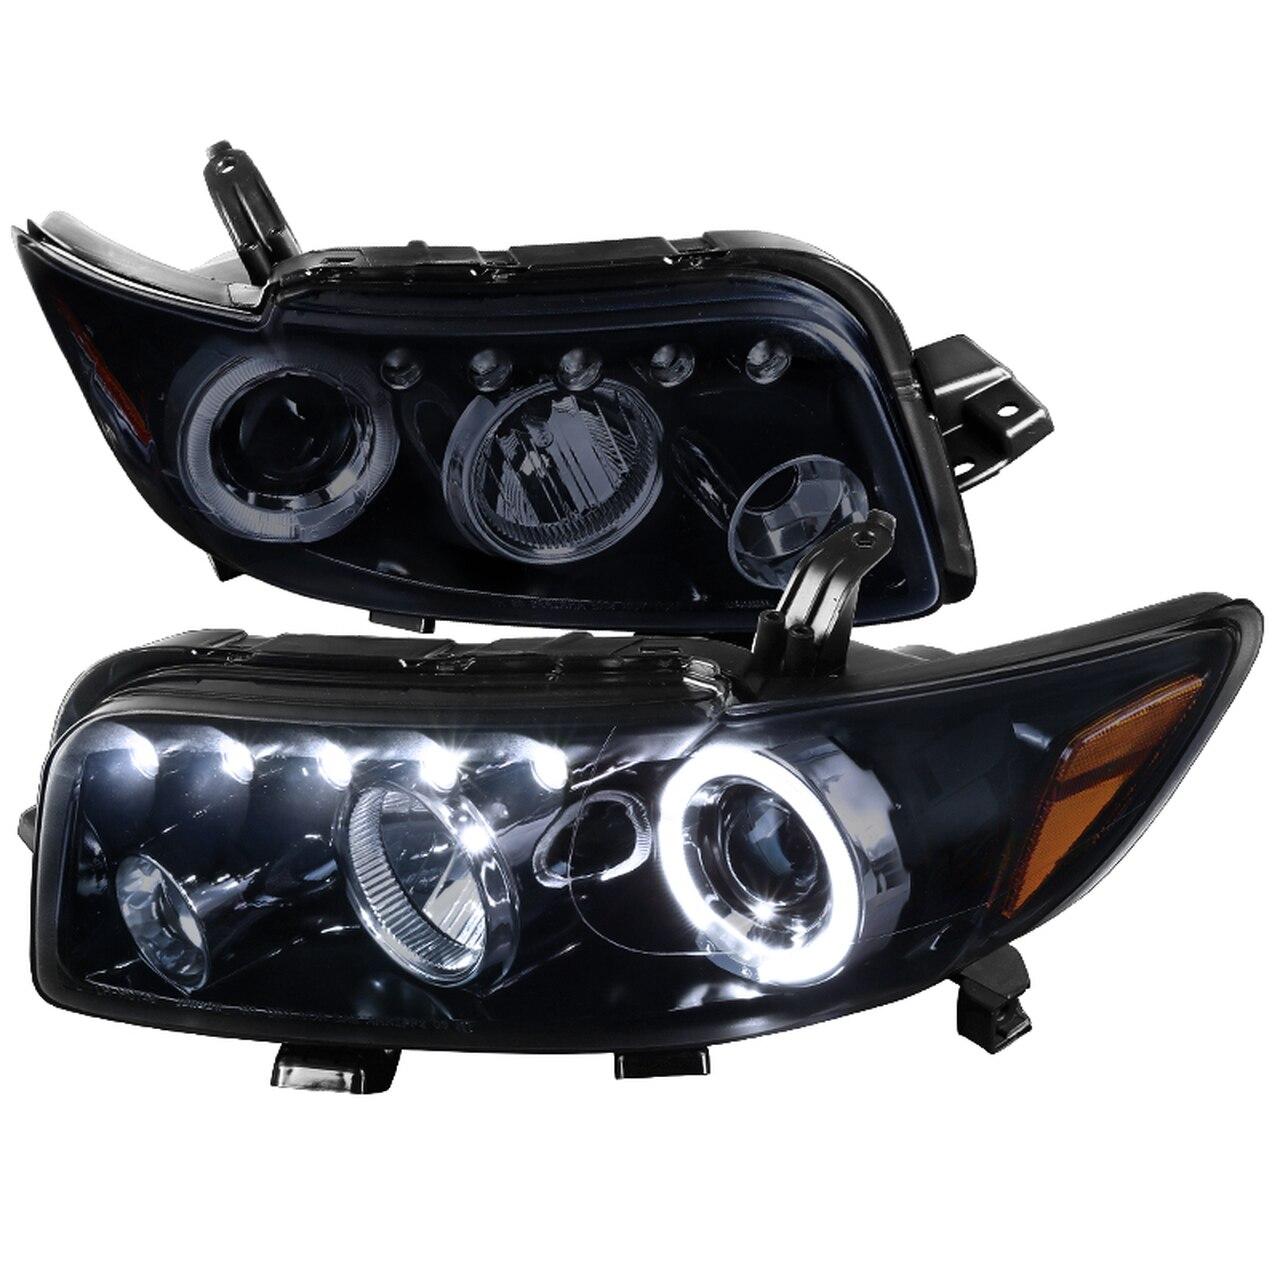 2008-2010 Scion XB Single Halo LED Projector Headlights (Glossy Black Housing/Smoke Lens)